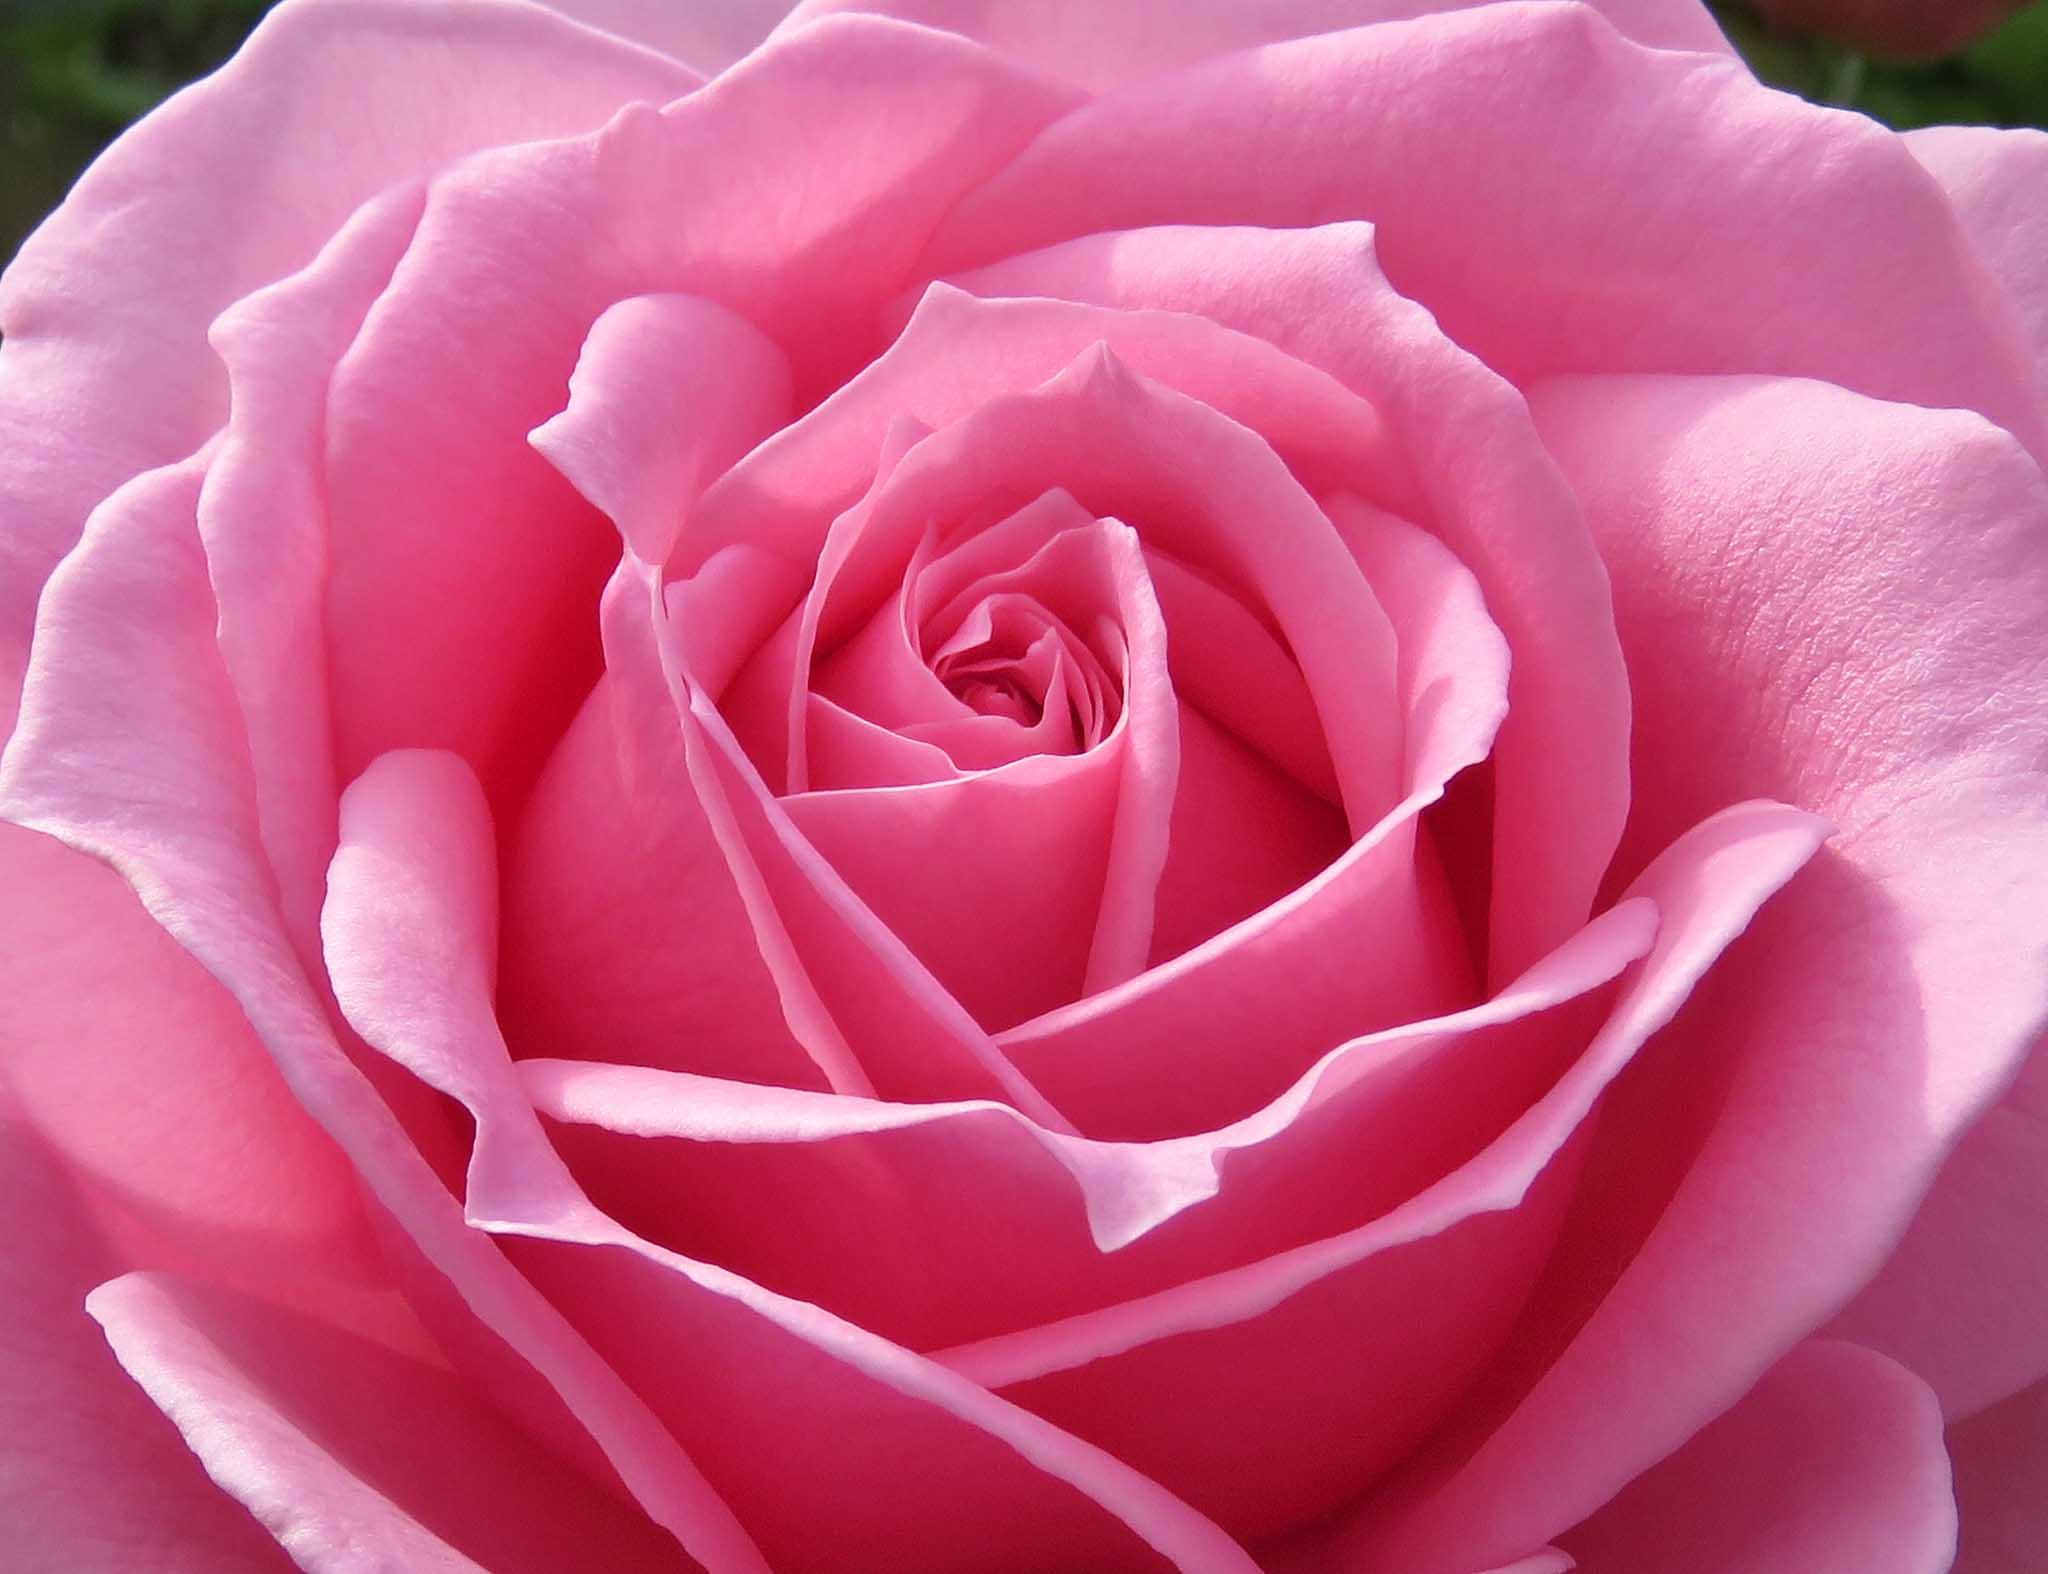 roses-reduced-9.jpg